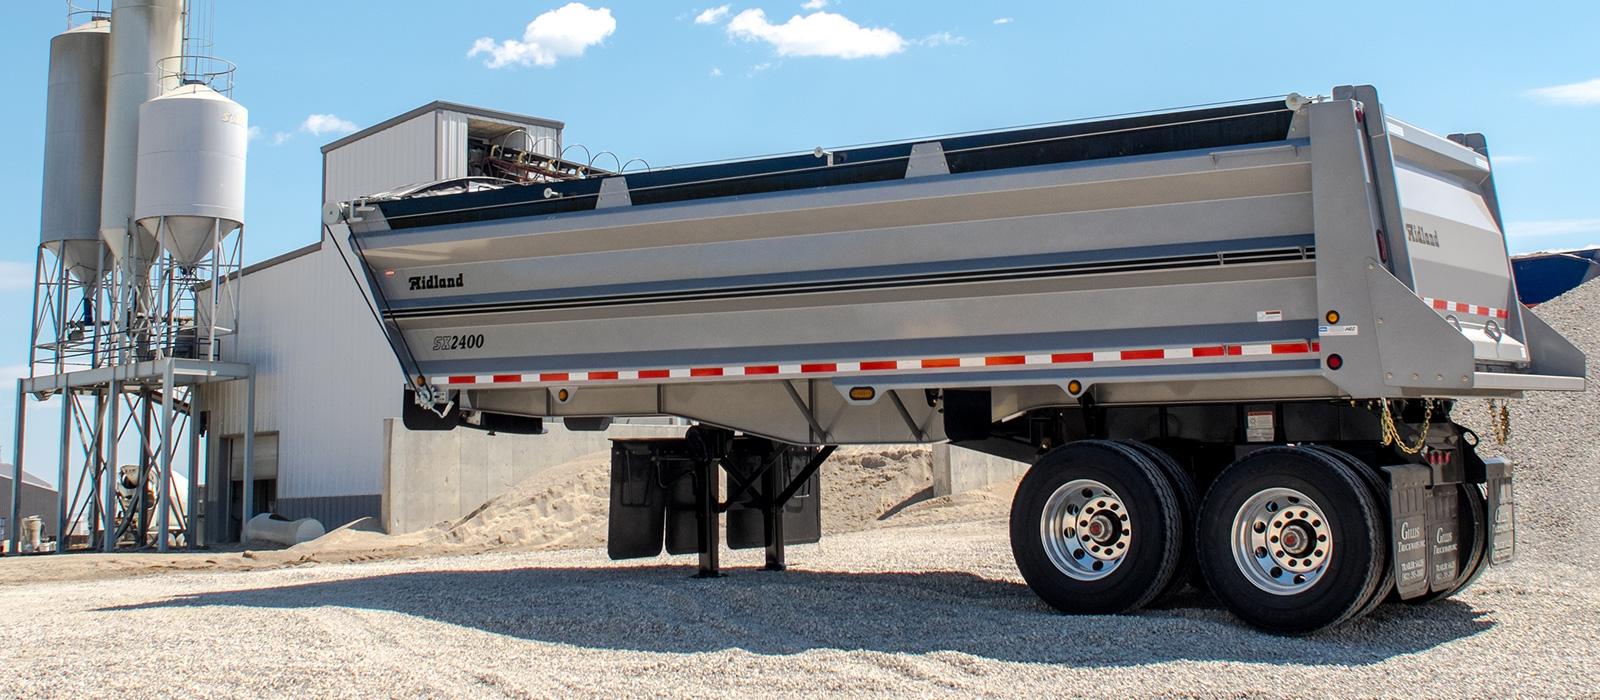 SX 2400 trailer